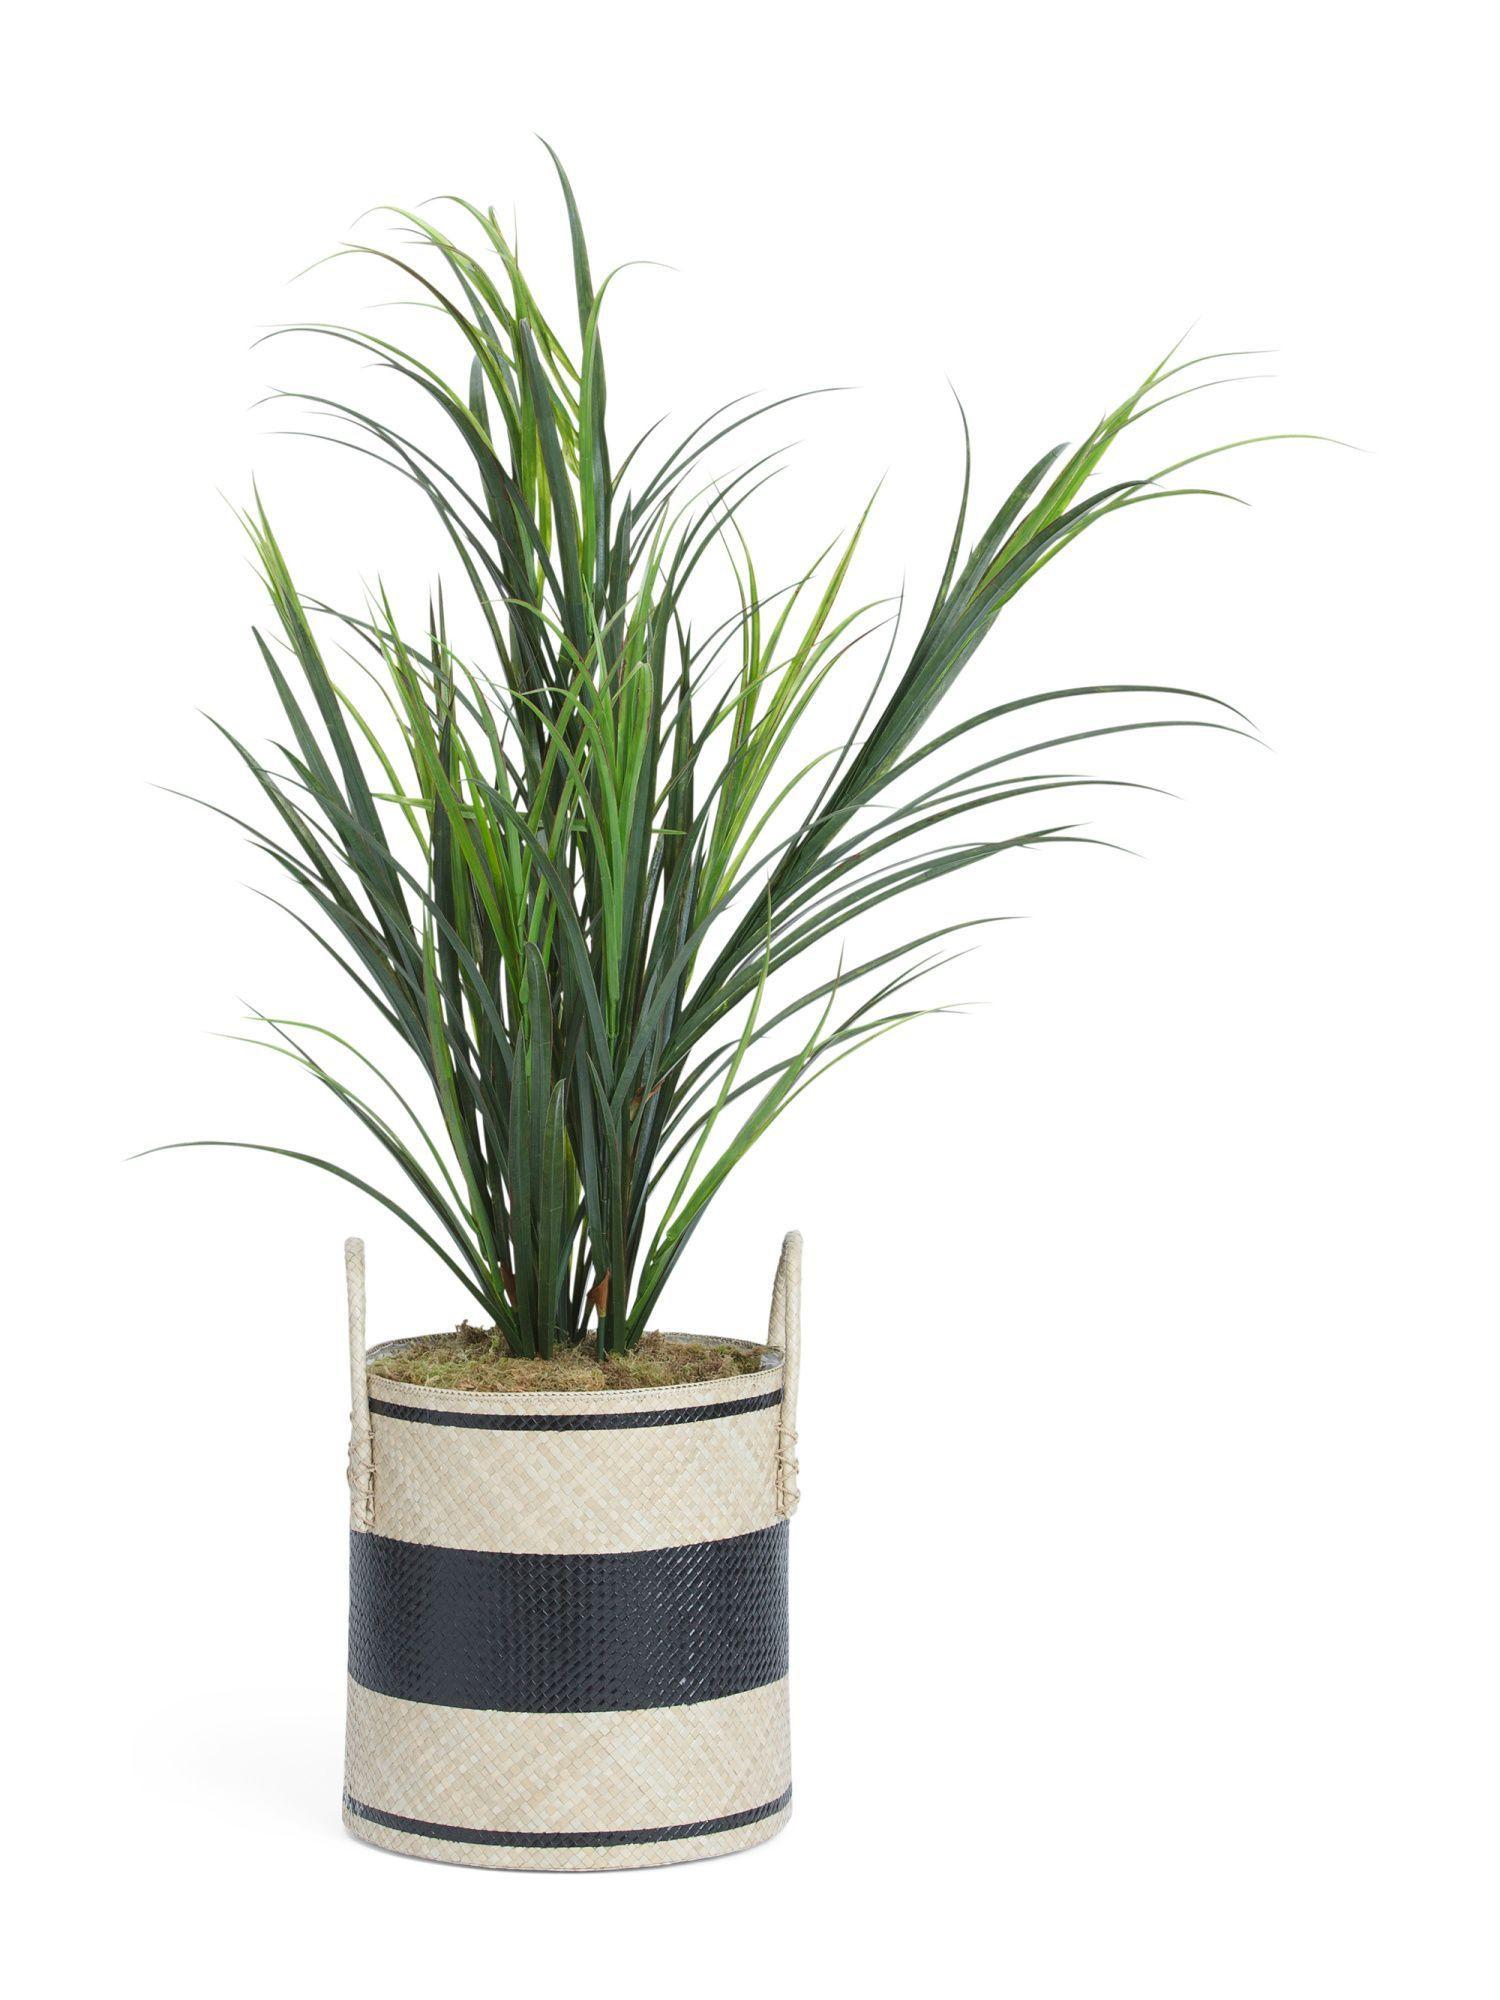 tj maxx vases of dracena grass plant products pinterest grasses plants and in 55in dracena grass plant artificial plants t j maxx